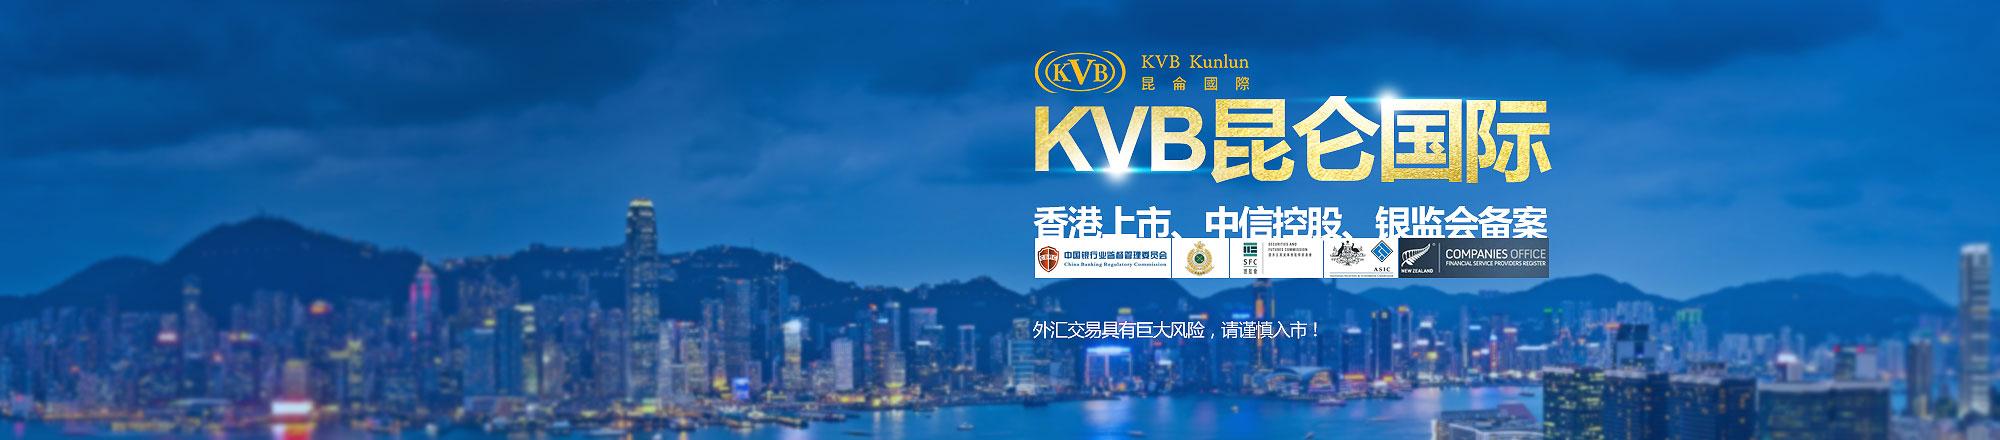 KVB昆仑国际开户